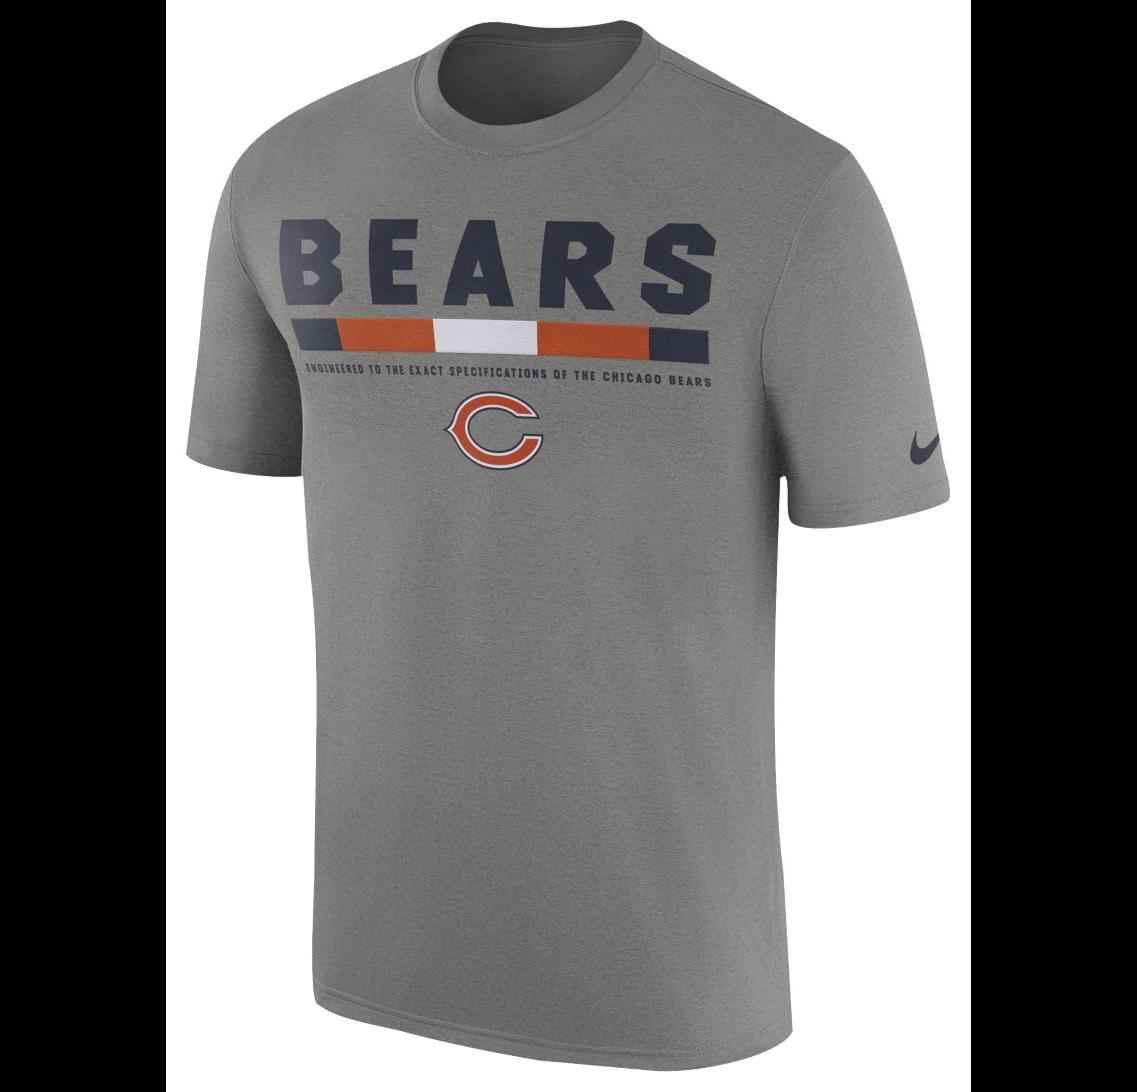 13a9b8d2 57. 57. Previous. Chicago Bears Men's Nike Legend Staff DRI-FIT T-Shirt ...